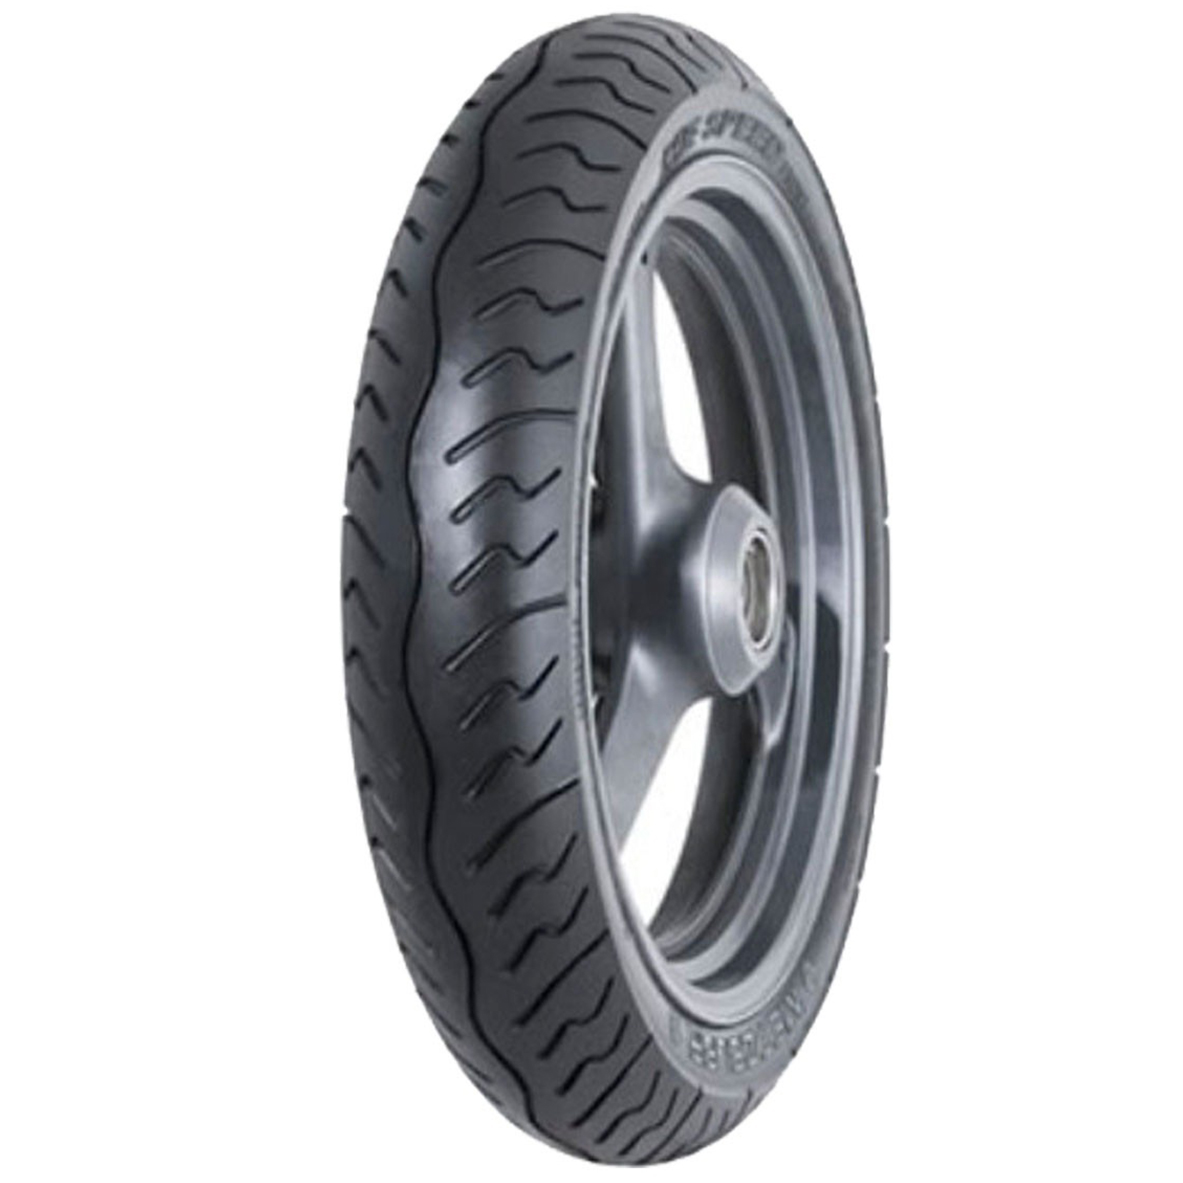 Metzeler ME SPEED 140/70 17 Tubeless 66 H Rear Two-Wheeler Tyre